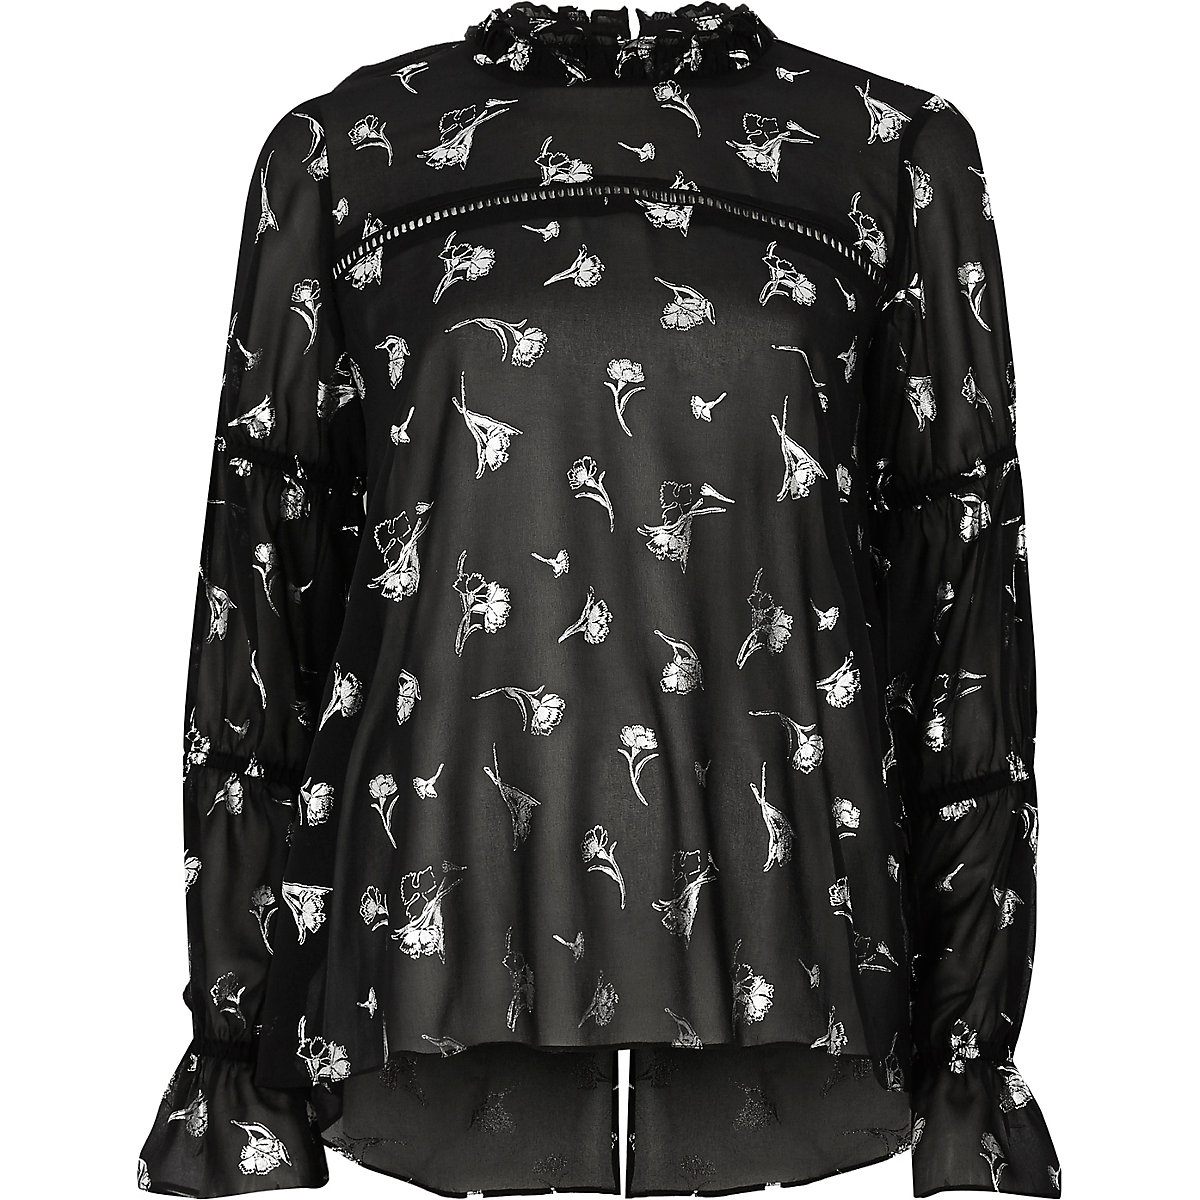 Schwarze Chiffon-Bluse mit Blumenprint